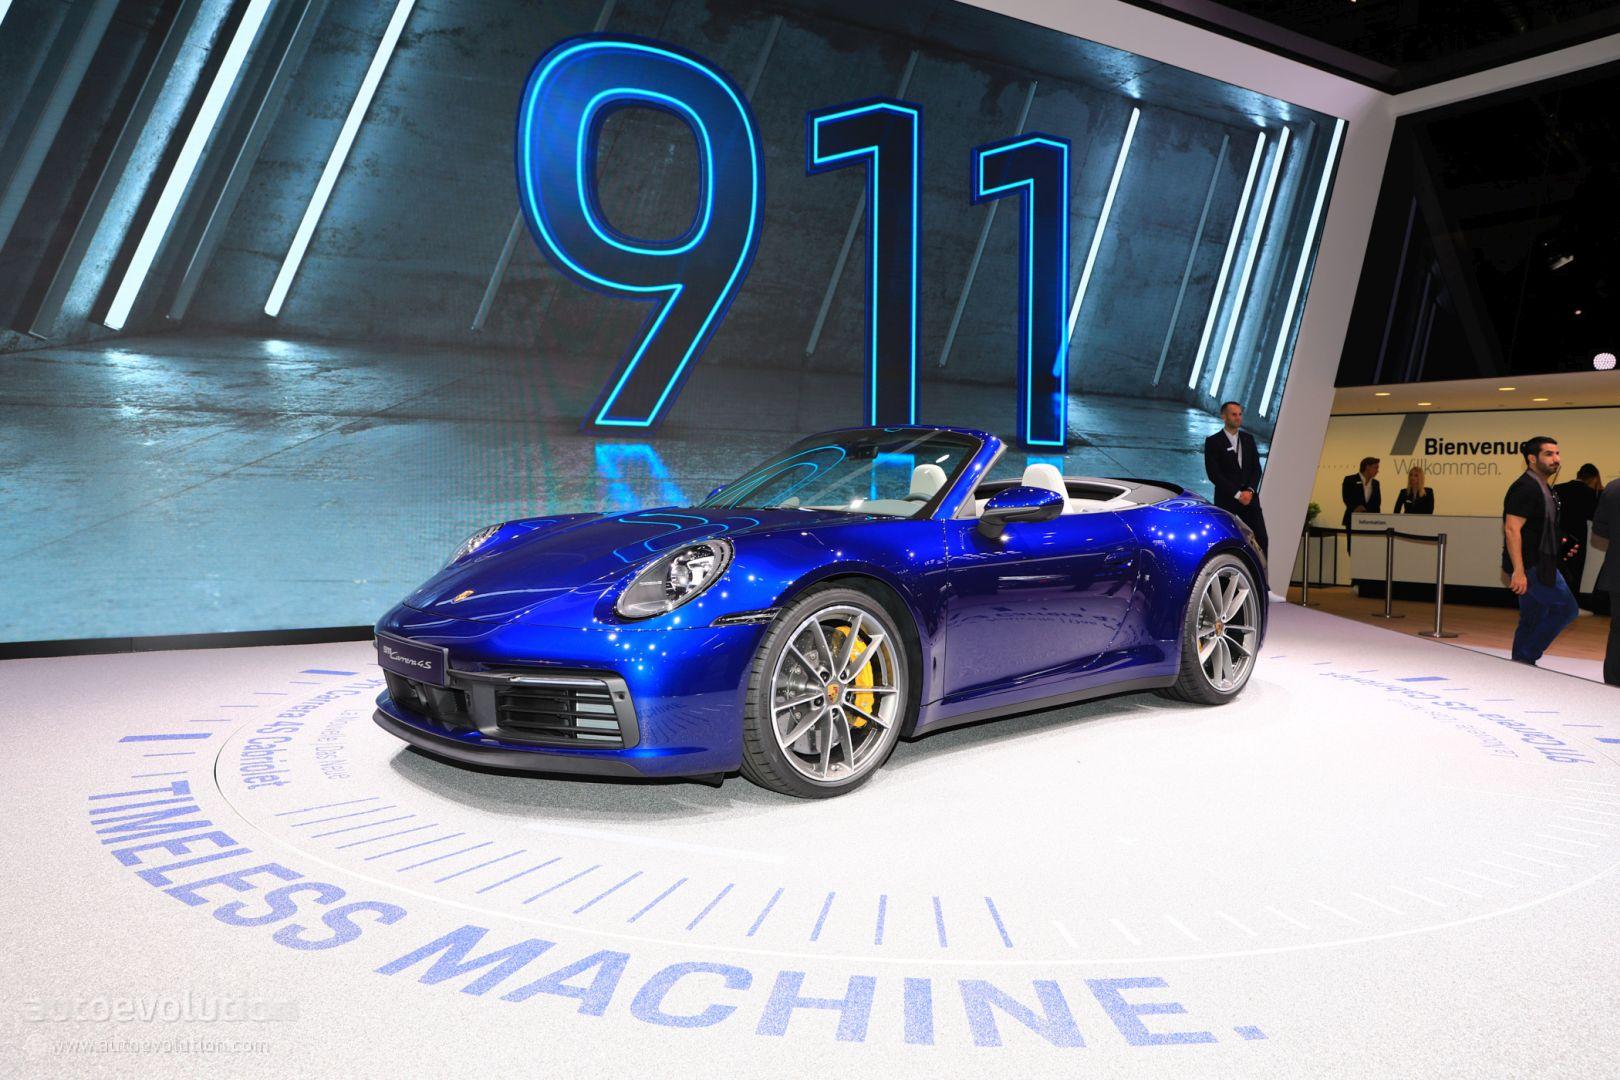 Gentian Blue 2020 Porsche 911 Cabriolet Looks Retro In Real World Photo Autoevolution